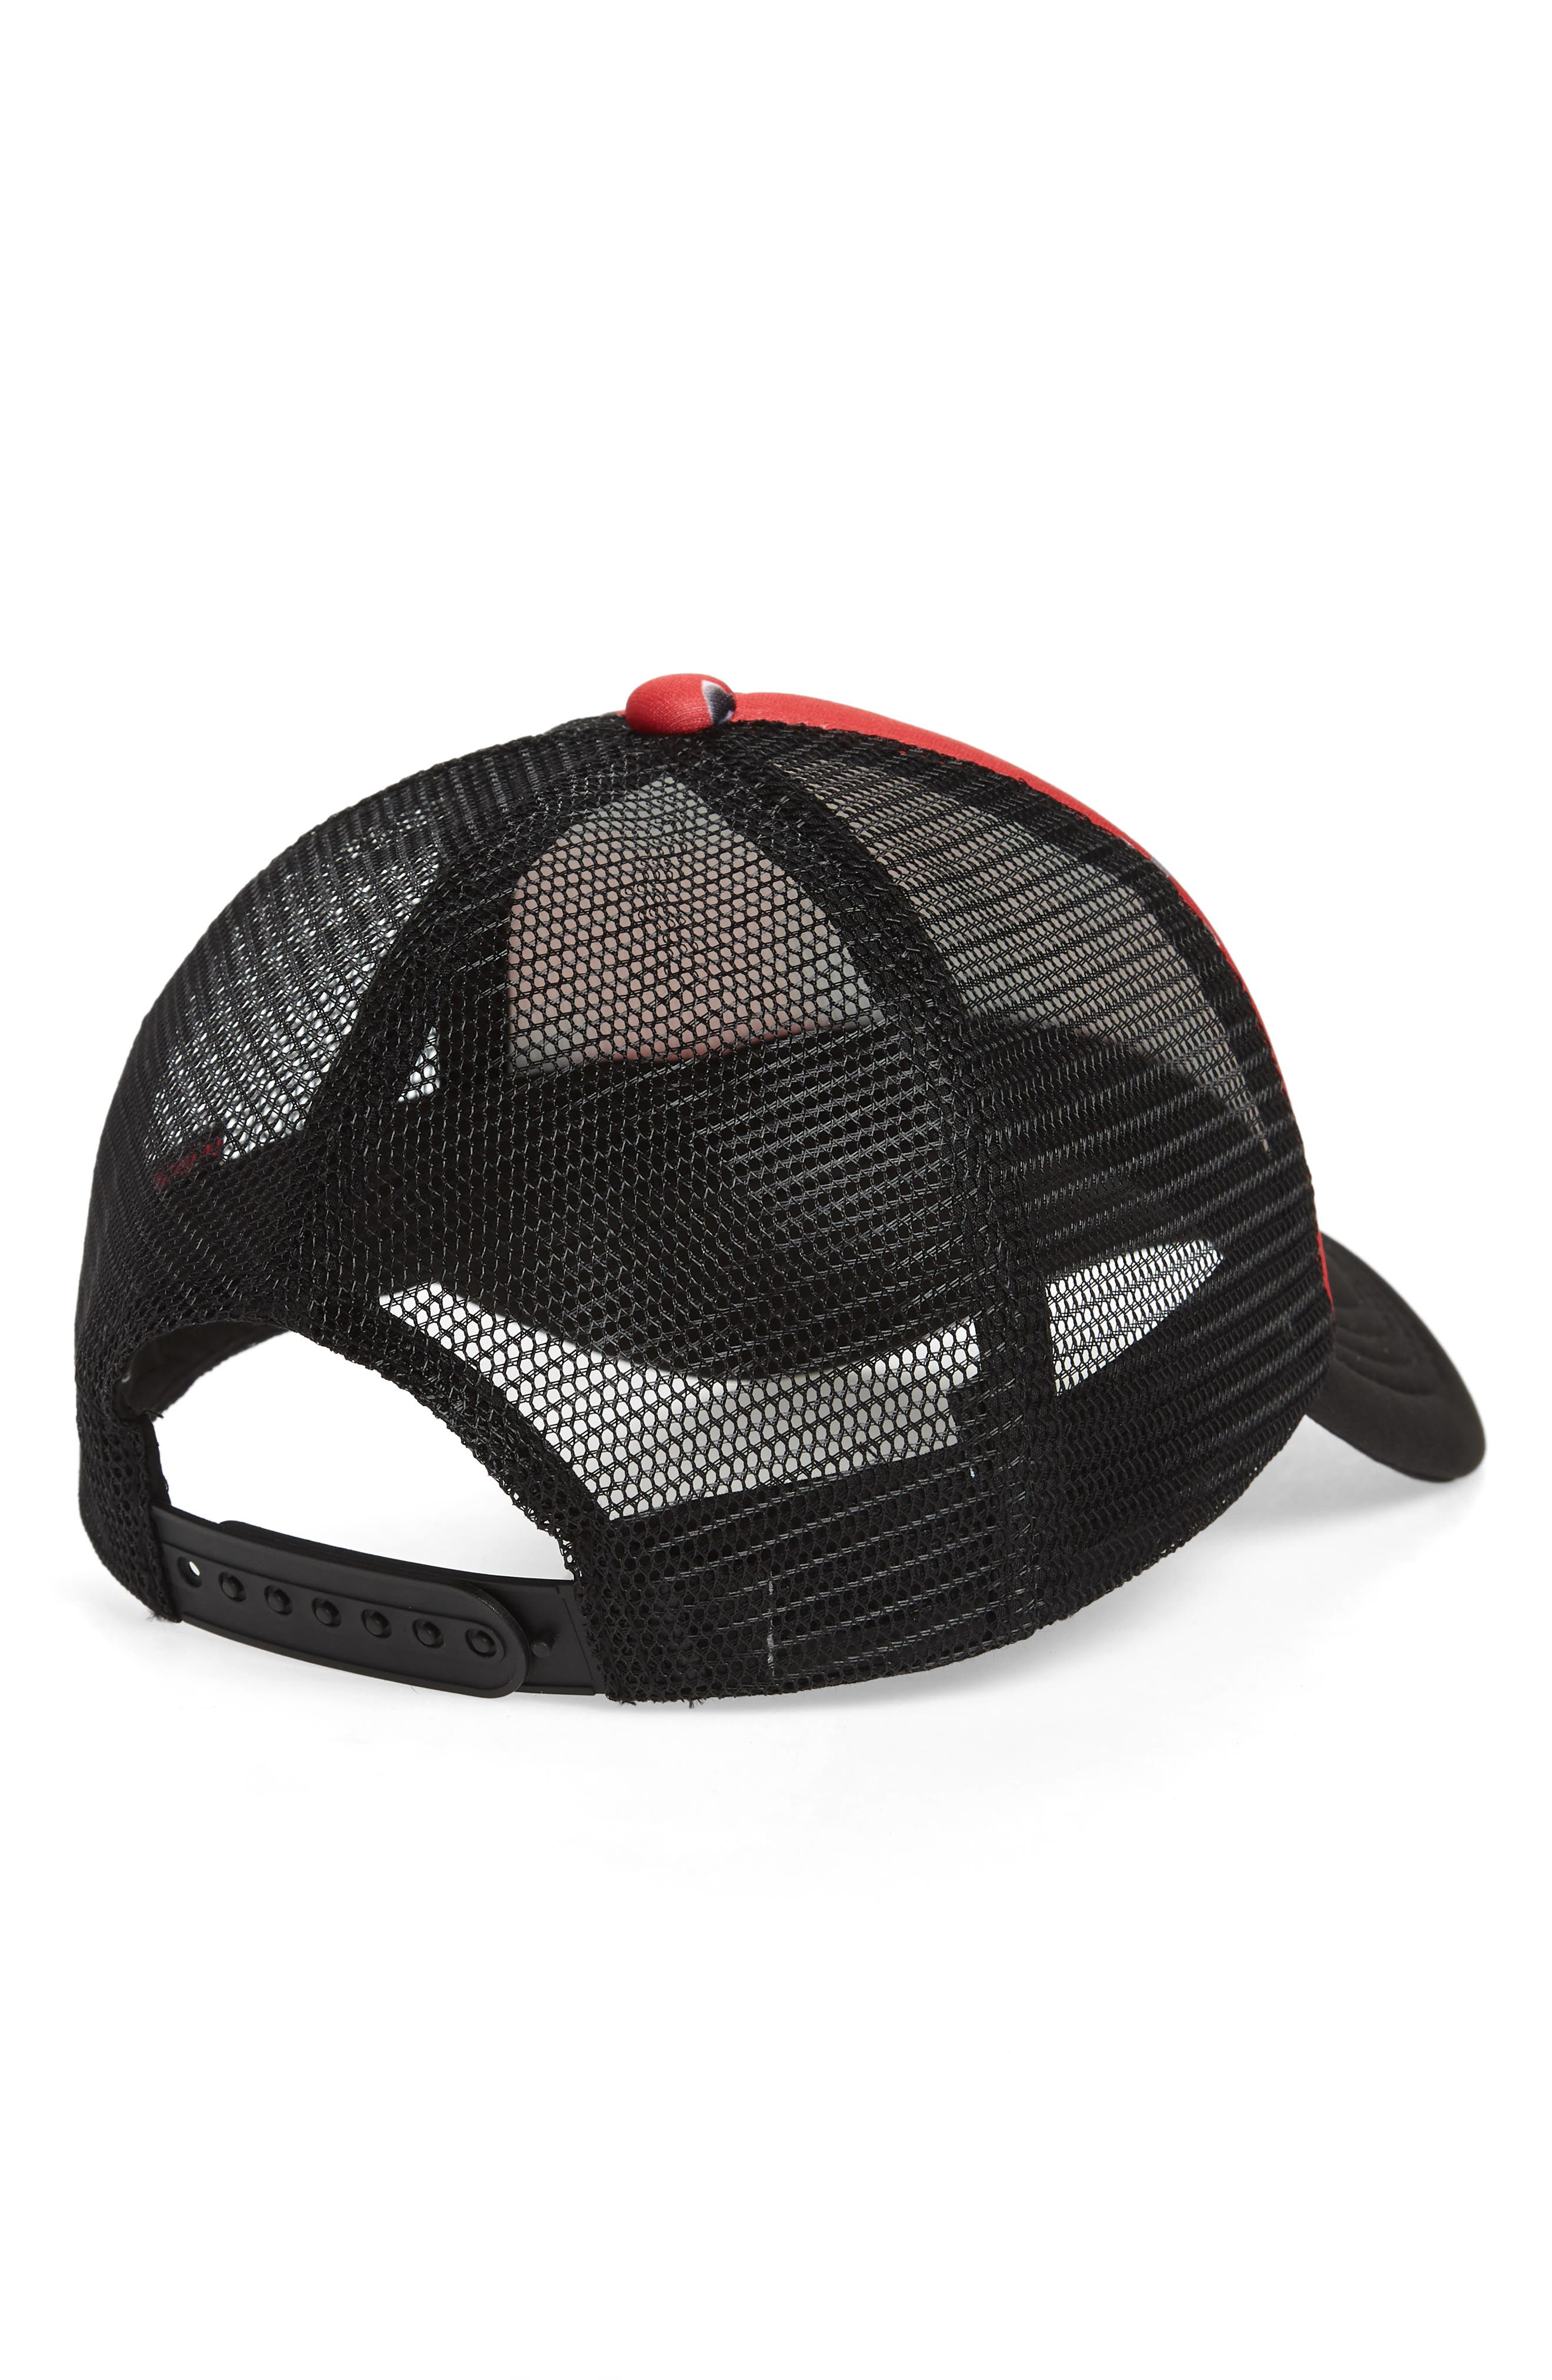 Tagurit Trucker Hat,                             Alternate thumbnail 2, color,                             Red Rad